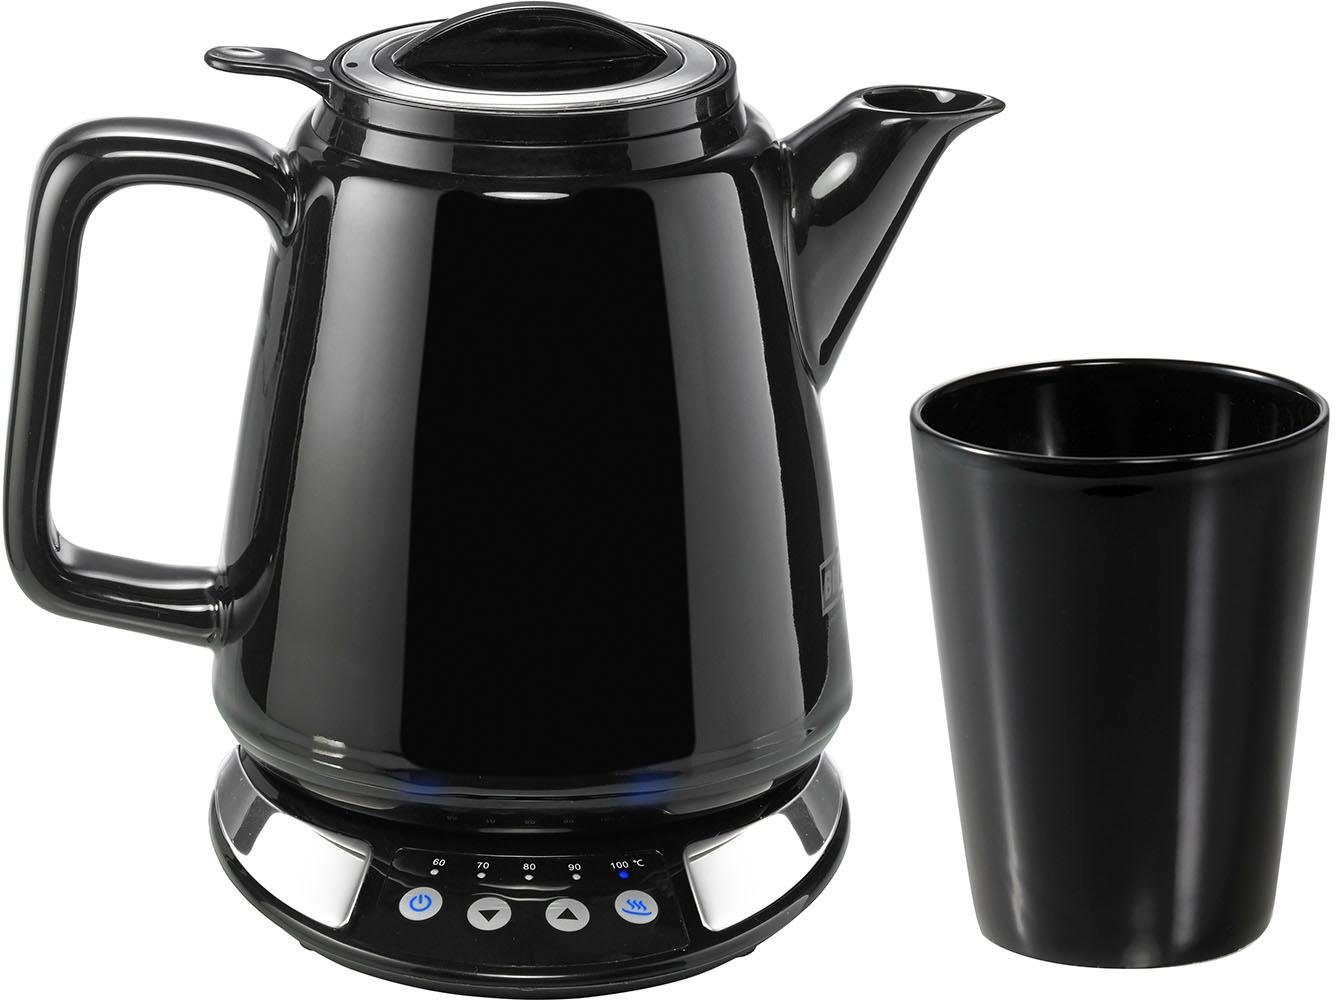 BEEM Wasserkocher i-Tea Wasser- & Teekocher Porzellan Schwarz mit Becher, 0,85 l, 1630 W